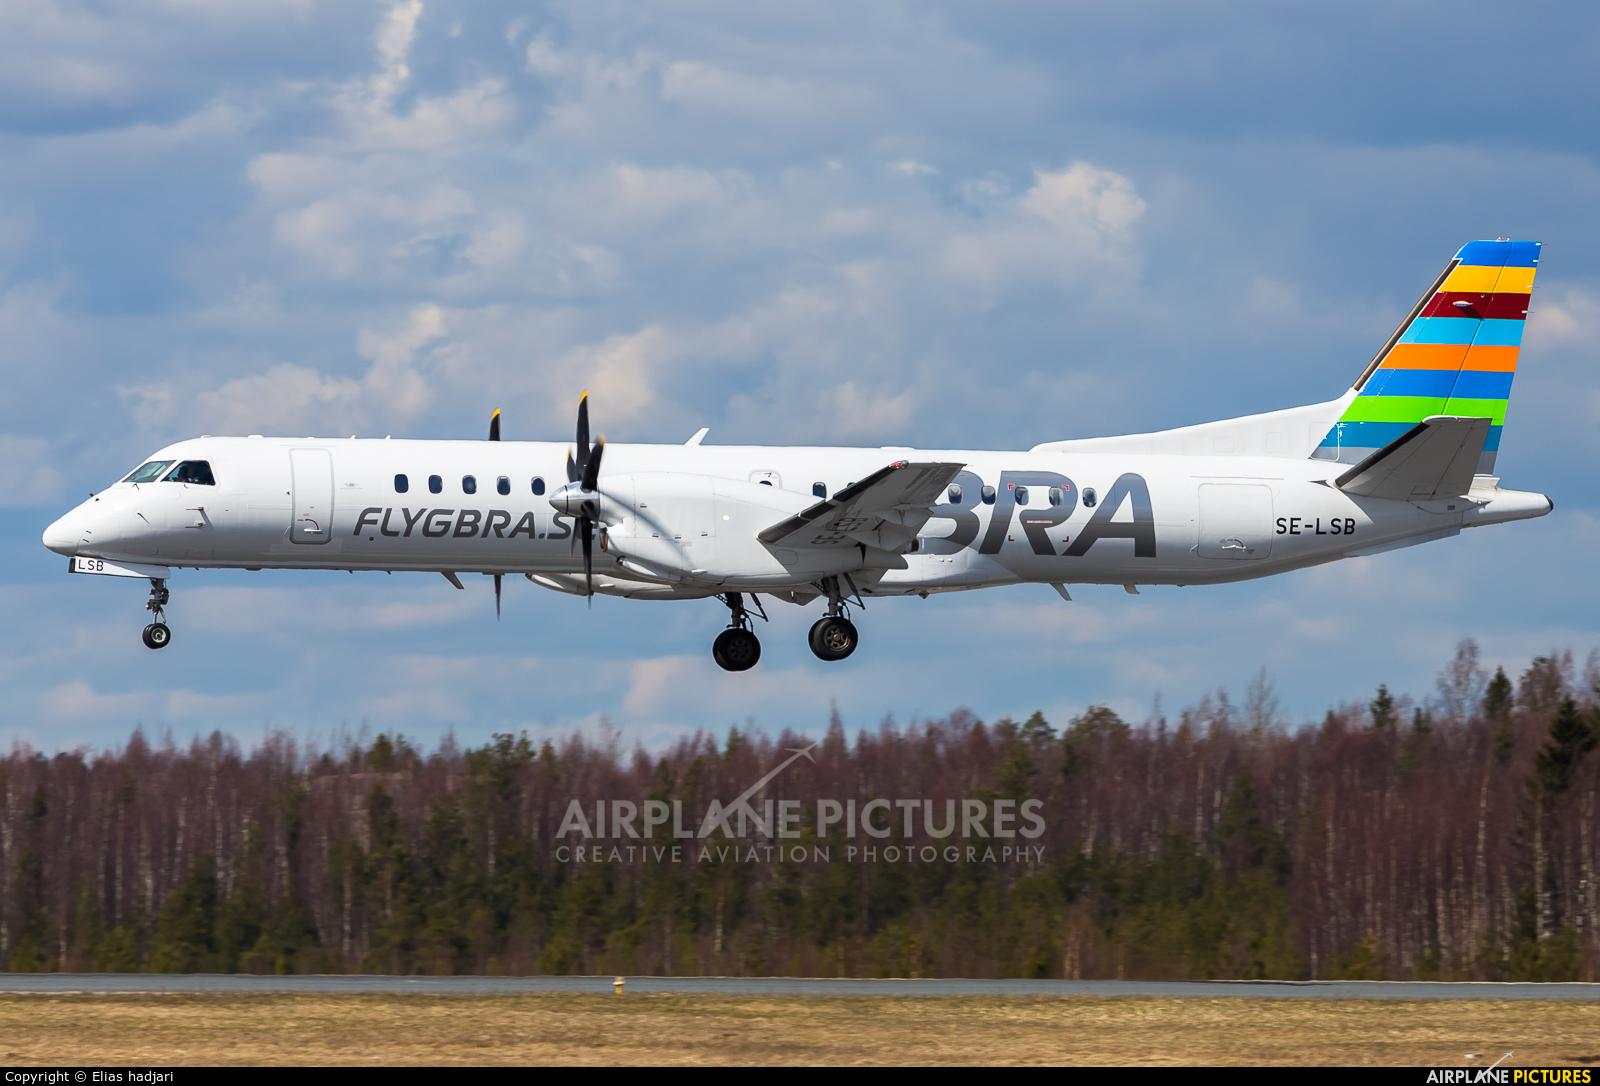 BRA (Sweden) SE-LSB aircraft at Helsinki - Vantaa